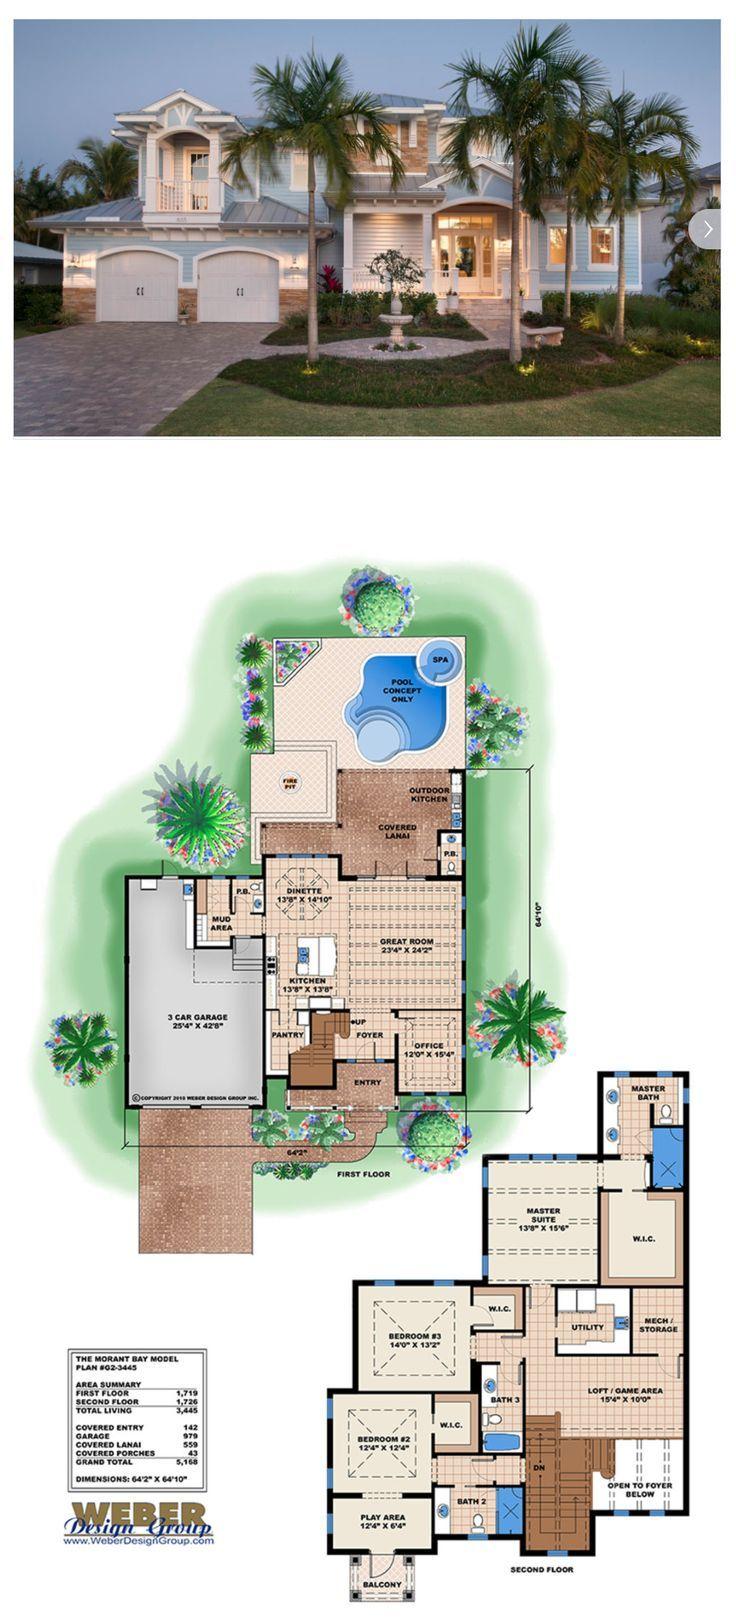 Beach House Plan Coastal Waterfront Home Floor Plan 2 Story Beach House Interior Beach House Plans Beach House Design